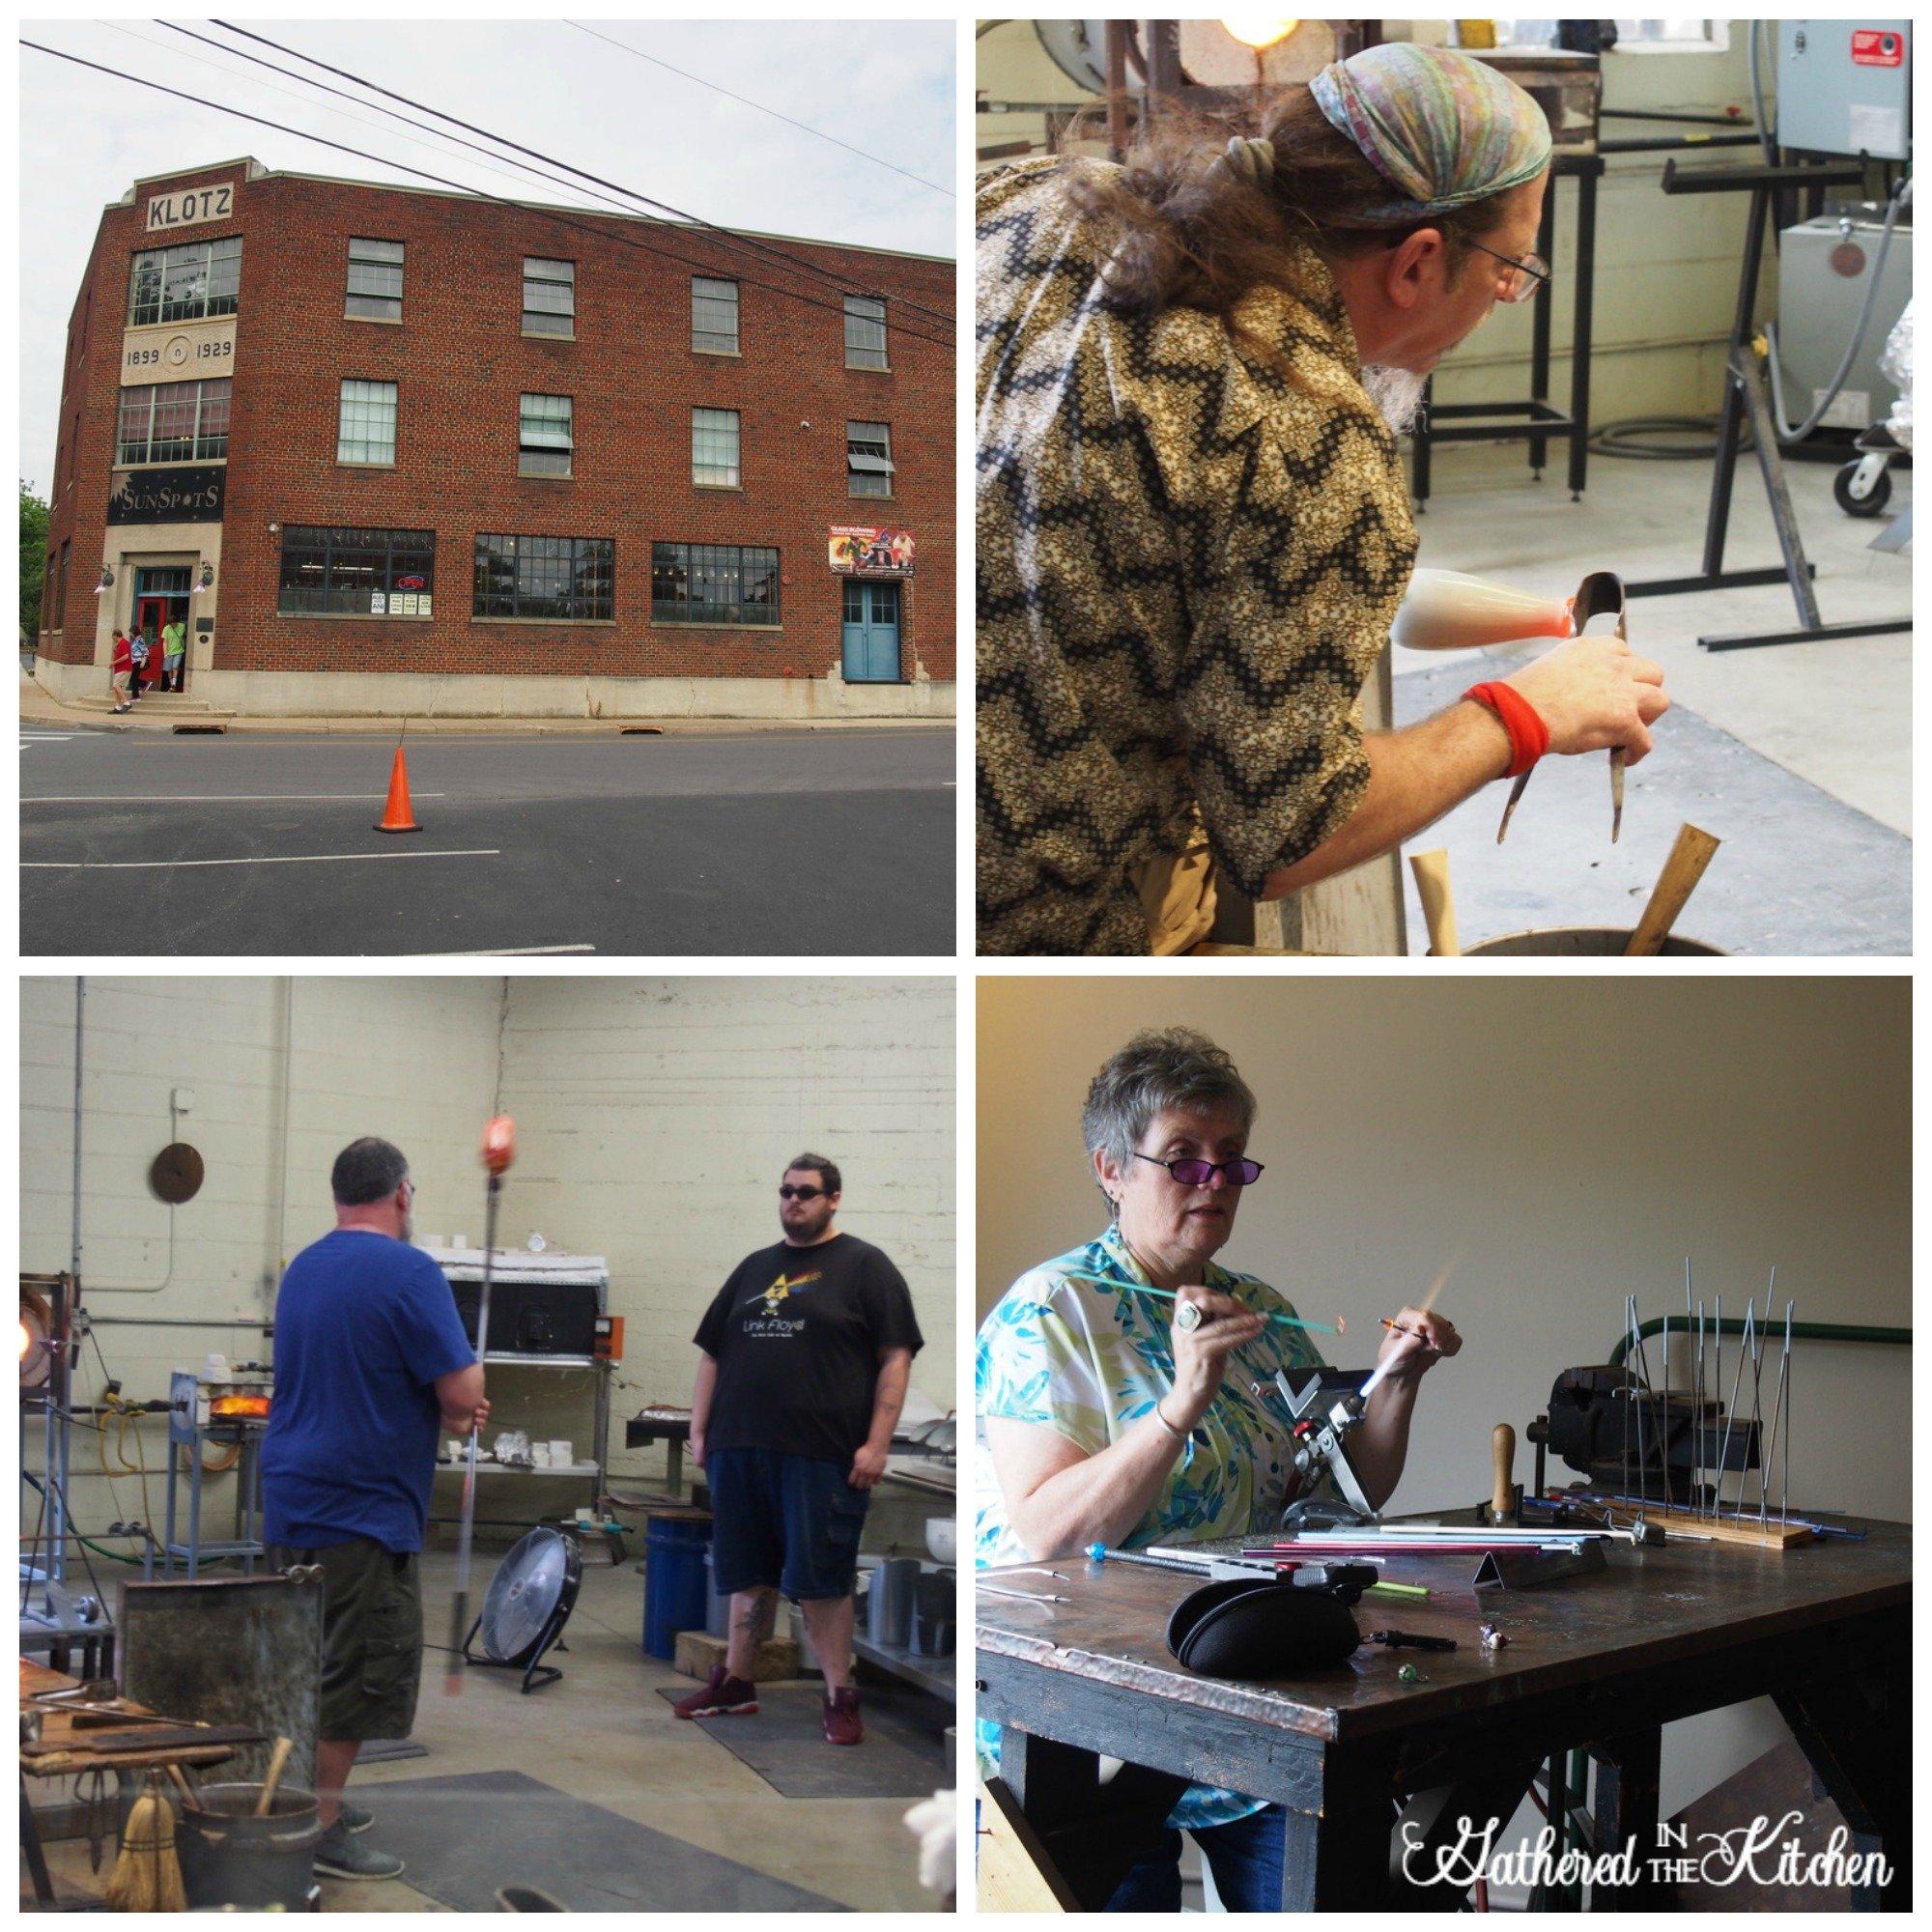 Glass Blowing at Sunspots Studios Live Glassblowing, Staunton, Virginia